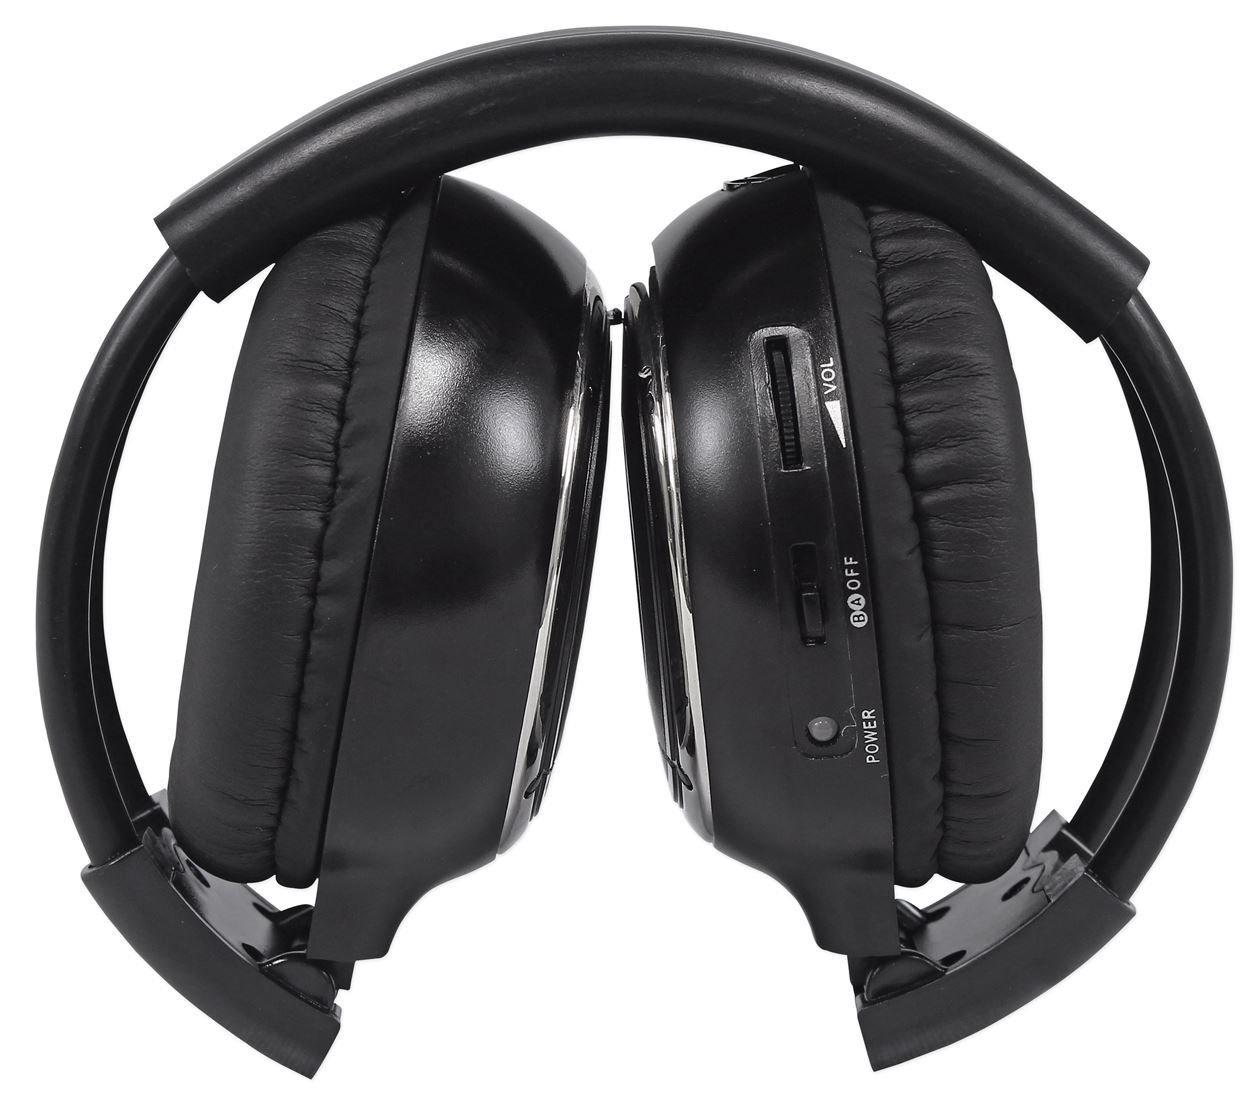 "Pair Rockville RHP7-BK 7"" Black TFT-LCD Car Headrest Monitors+2 Wireless Headset by Rockville (Image #8)"